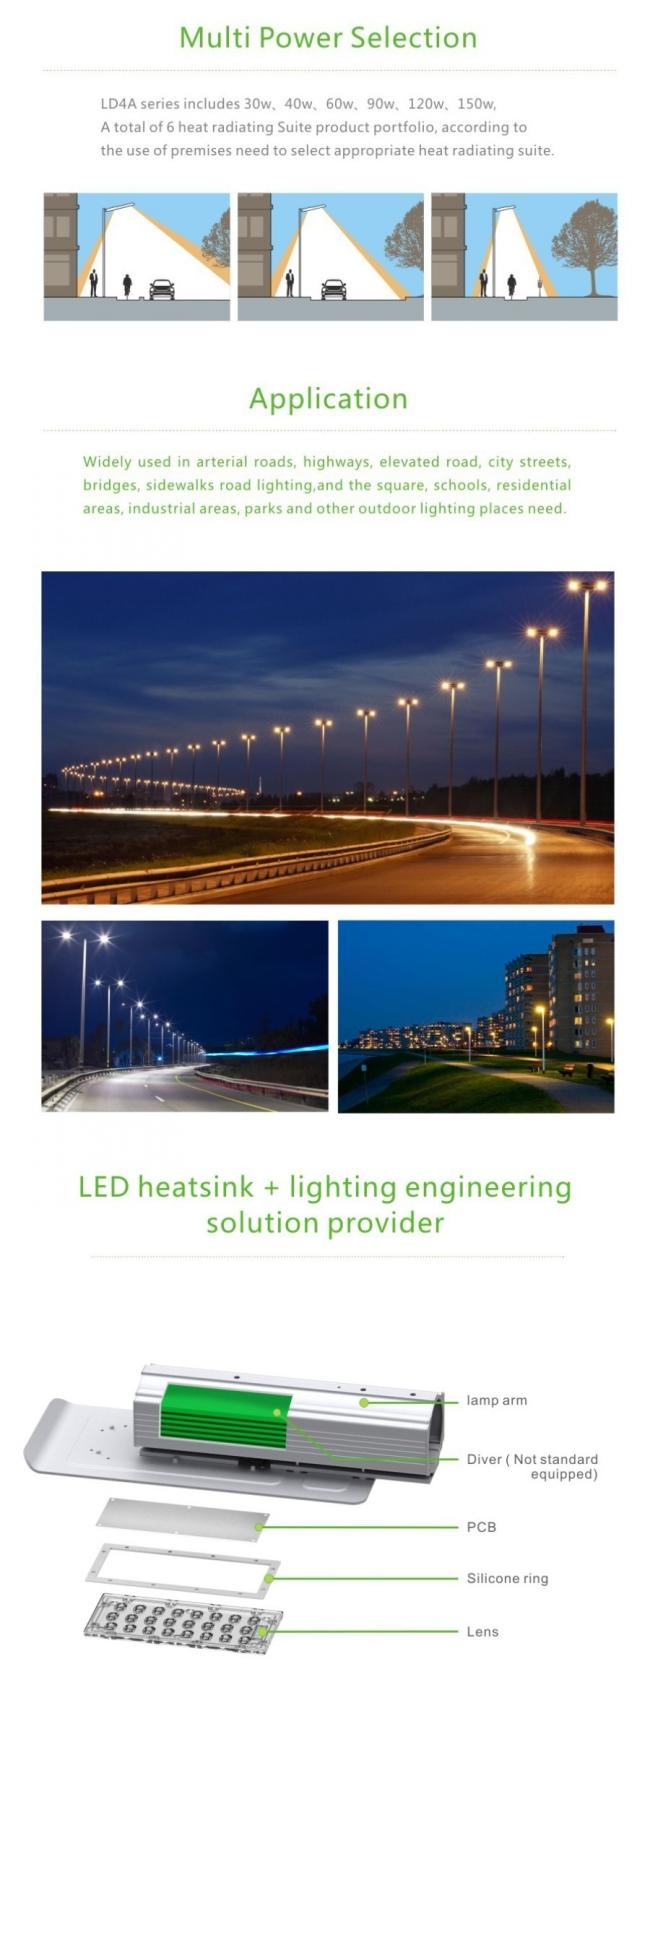 10kv Surge Protection 3030 Osram 120 Watt LED Street Light 12000lm Outdoor